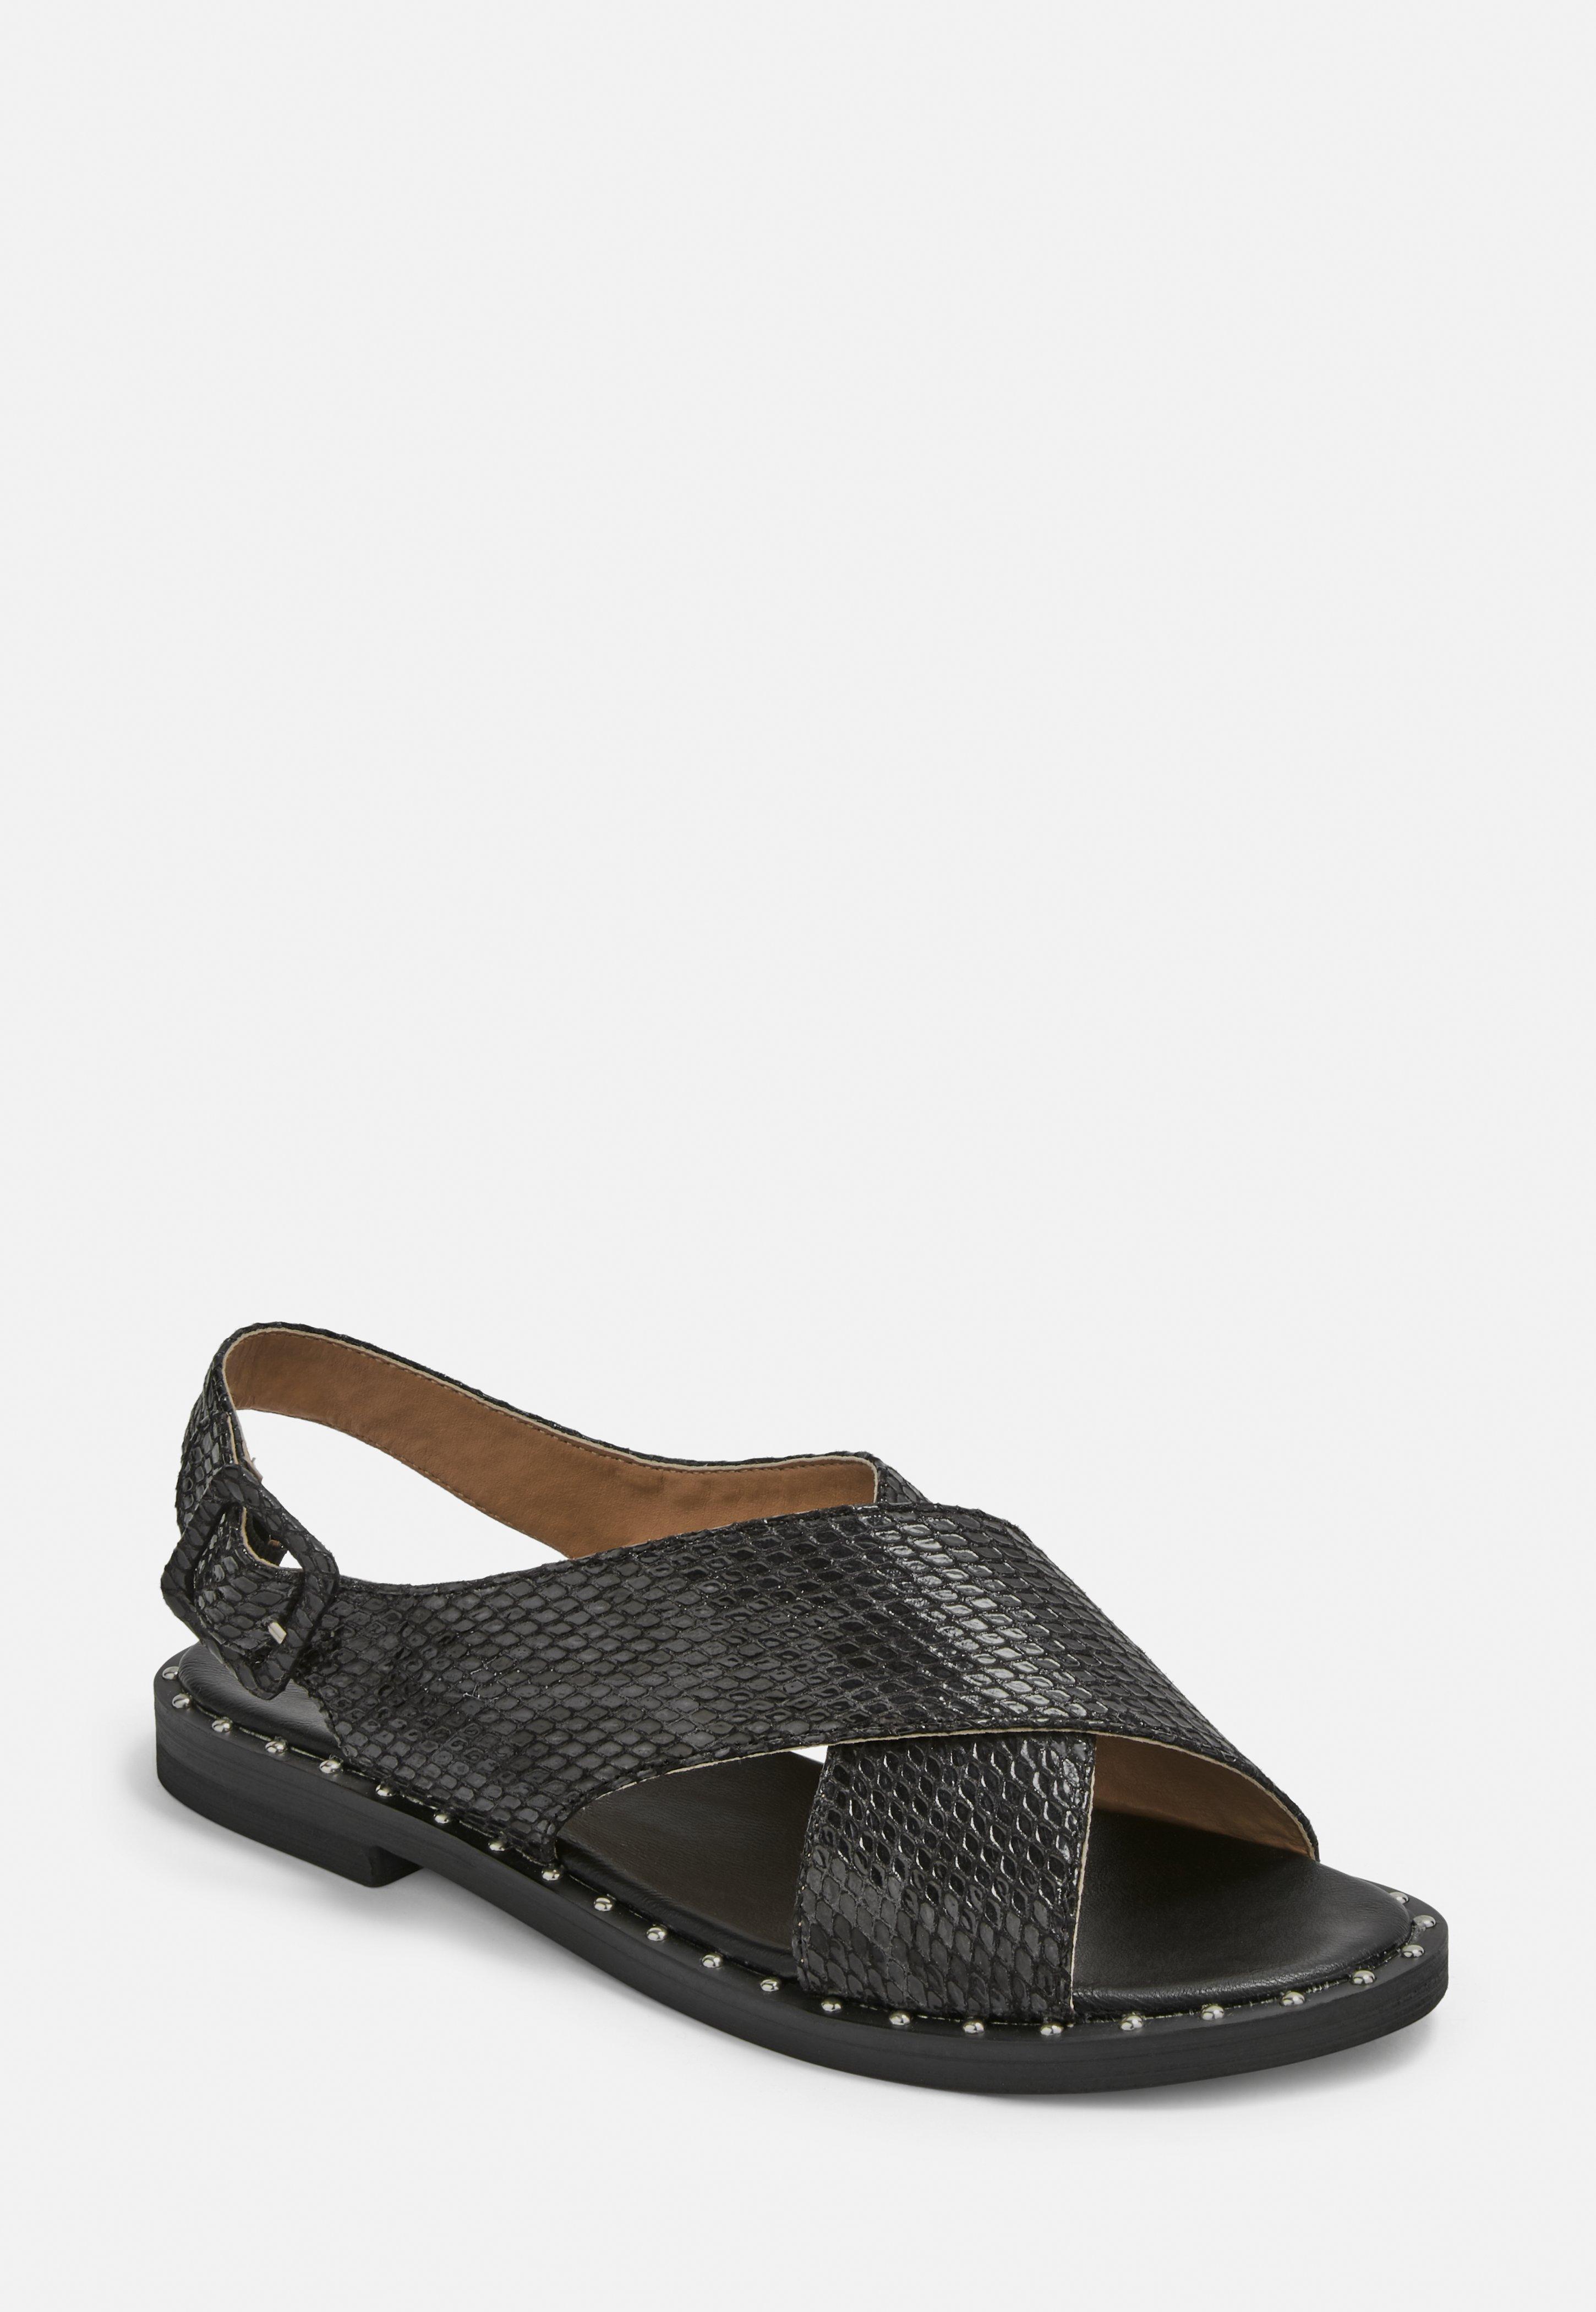 fd4c14842a49 Sandals UK - Womens Sandals Online - Flip Flops- Missguided